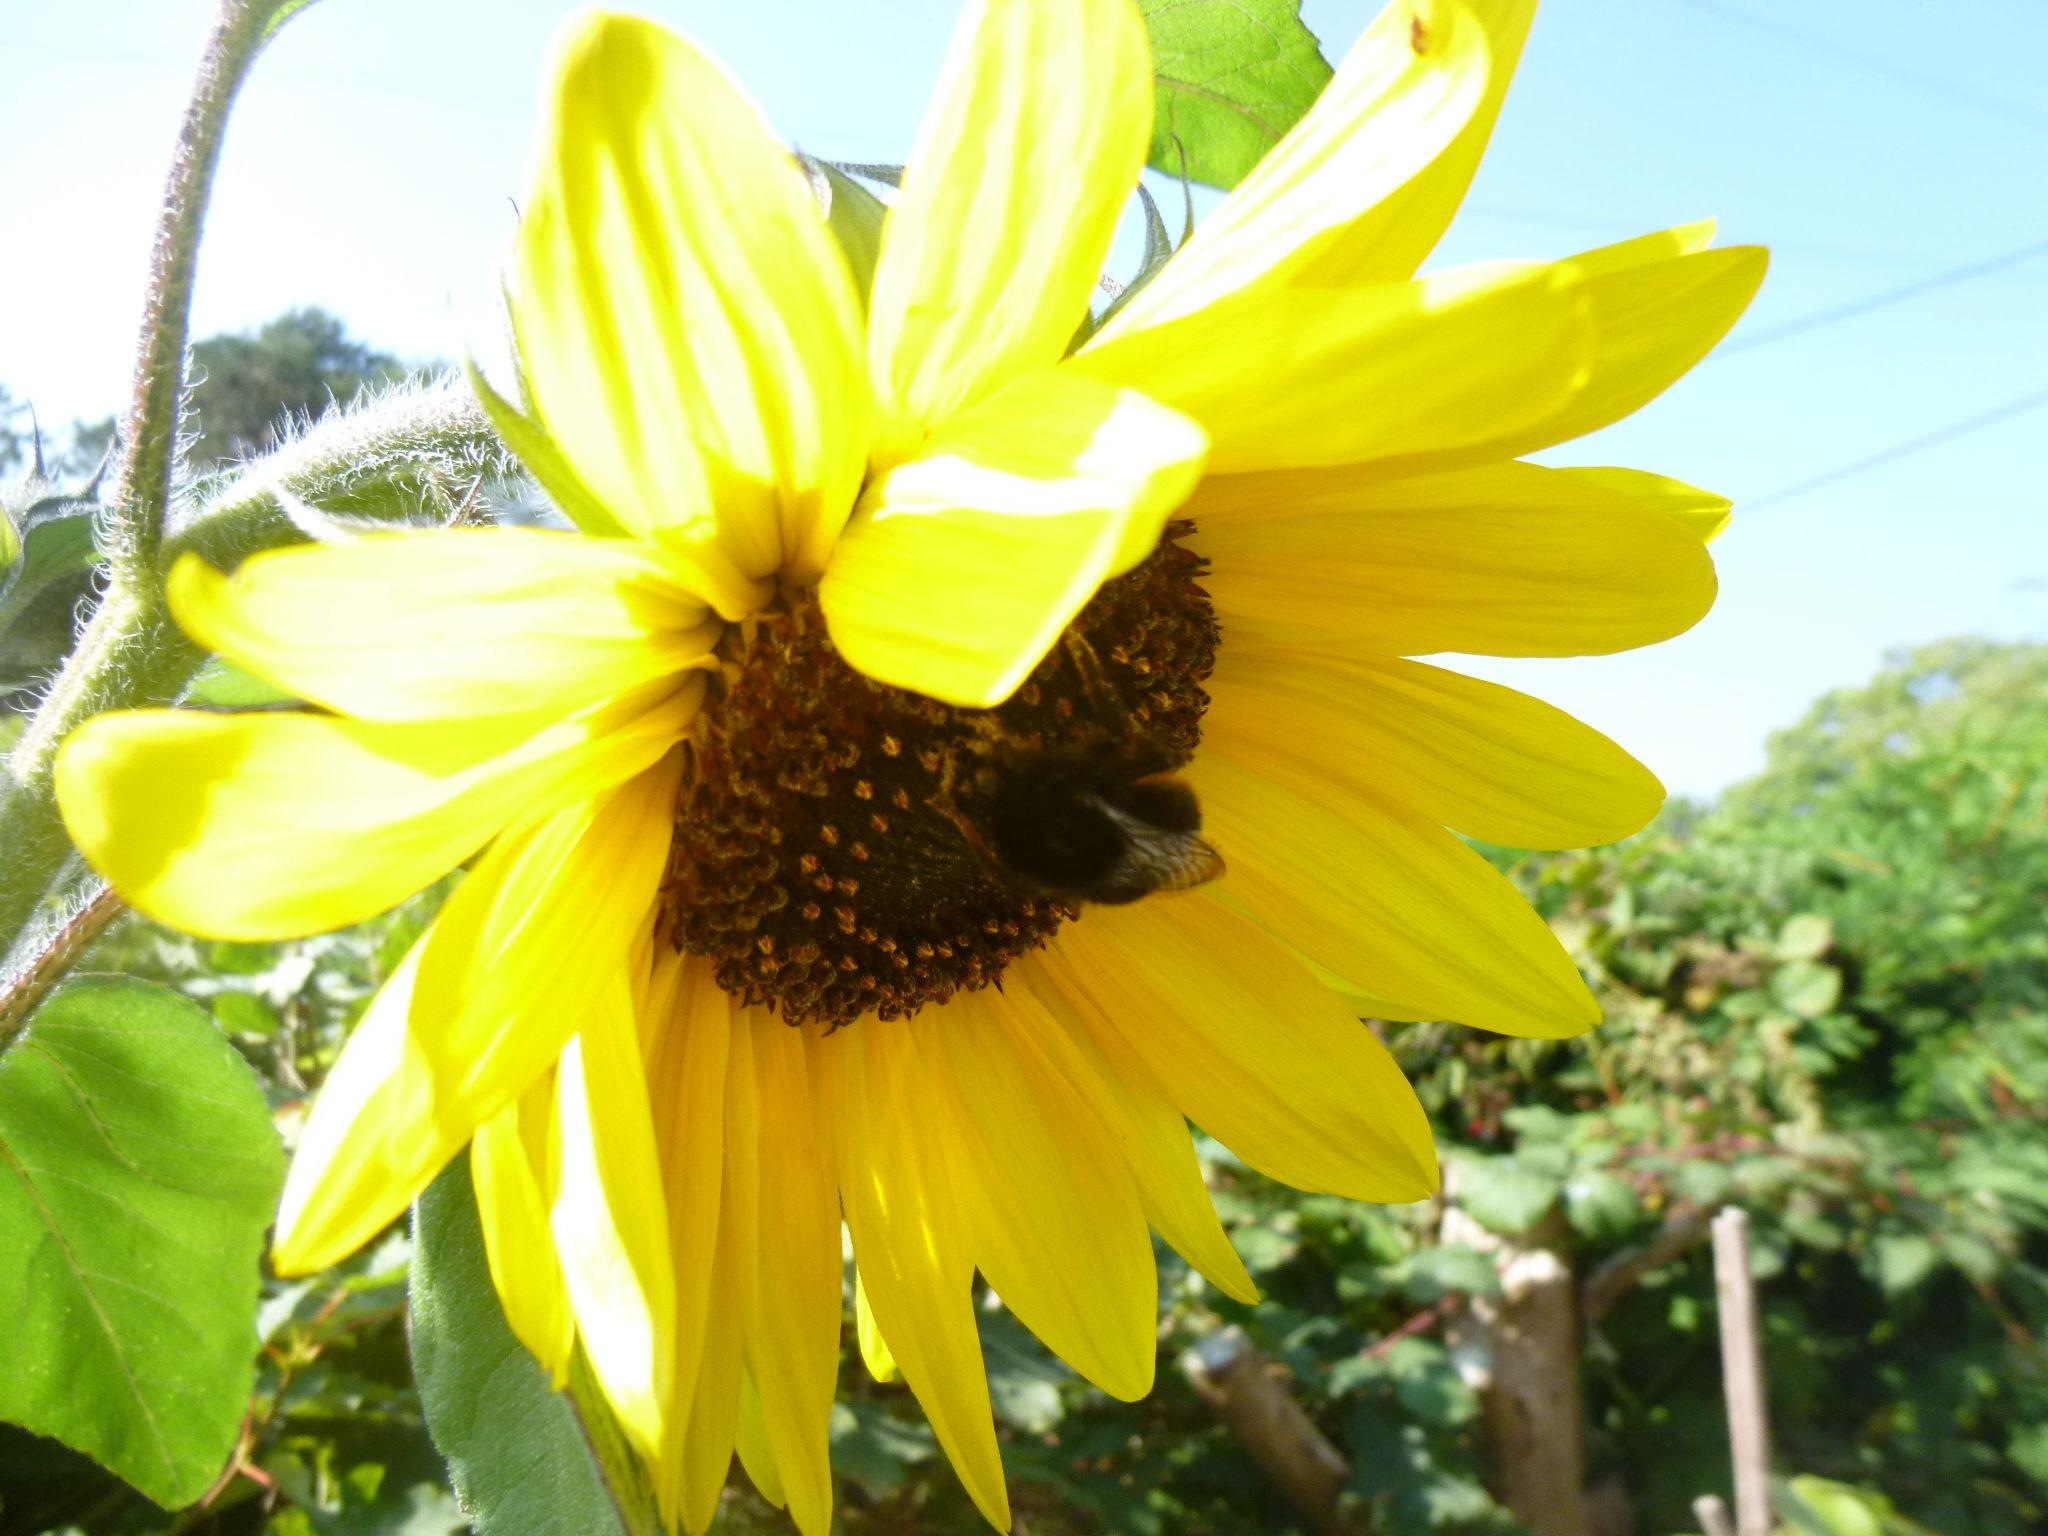 sunflower by chris.adams.3557